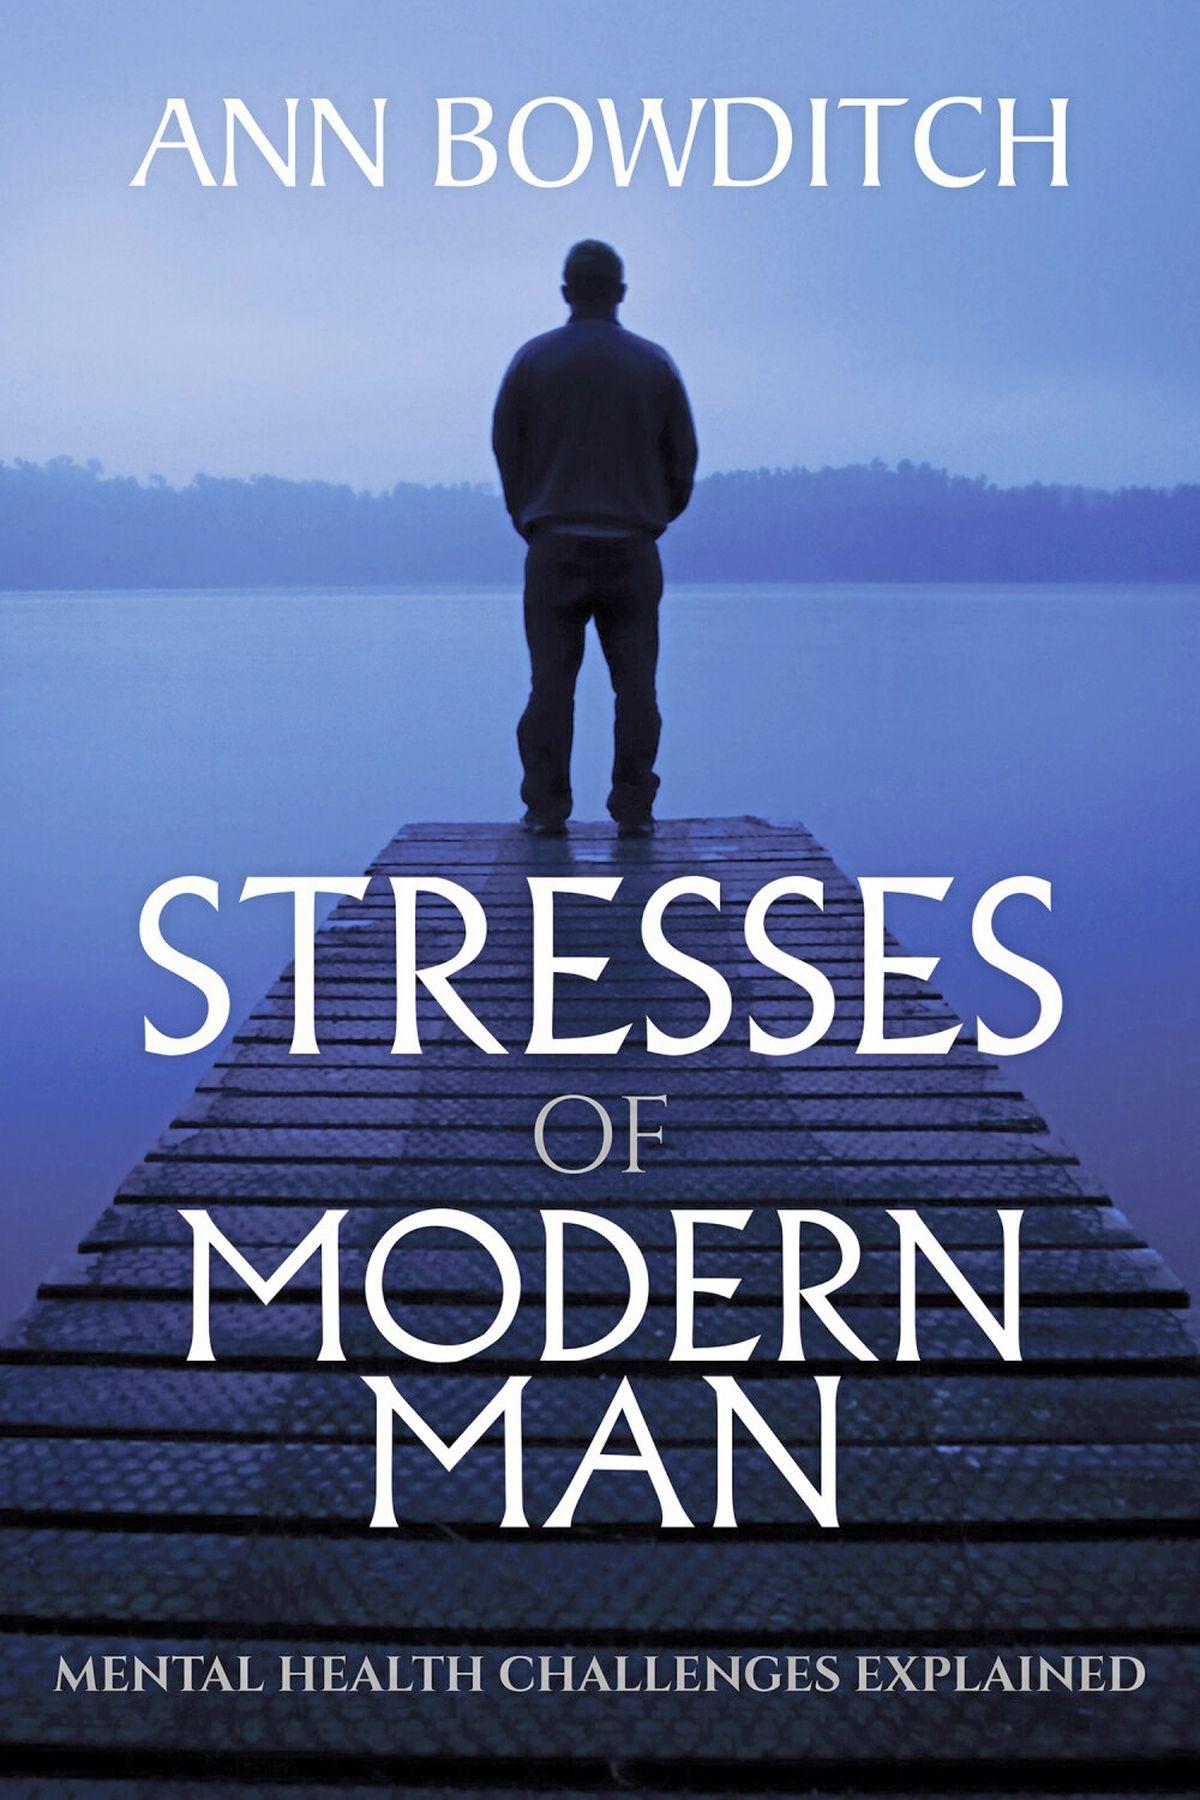 Stresses of Modern Man by Ann Bowditch. (29464117)